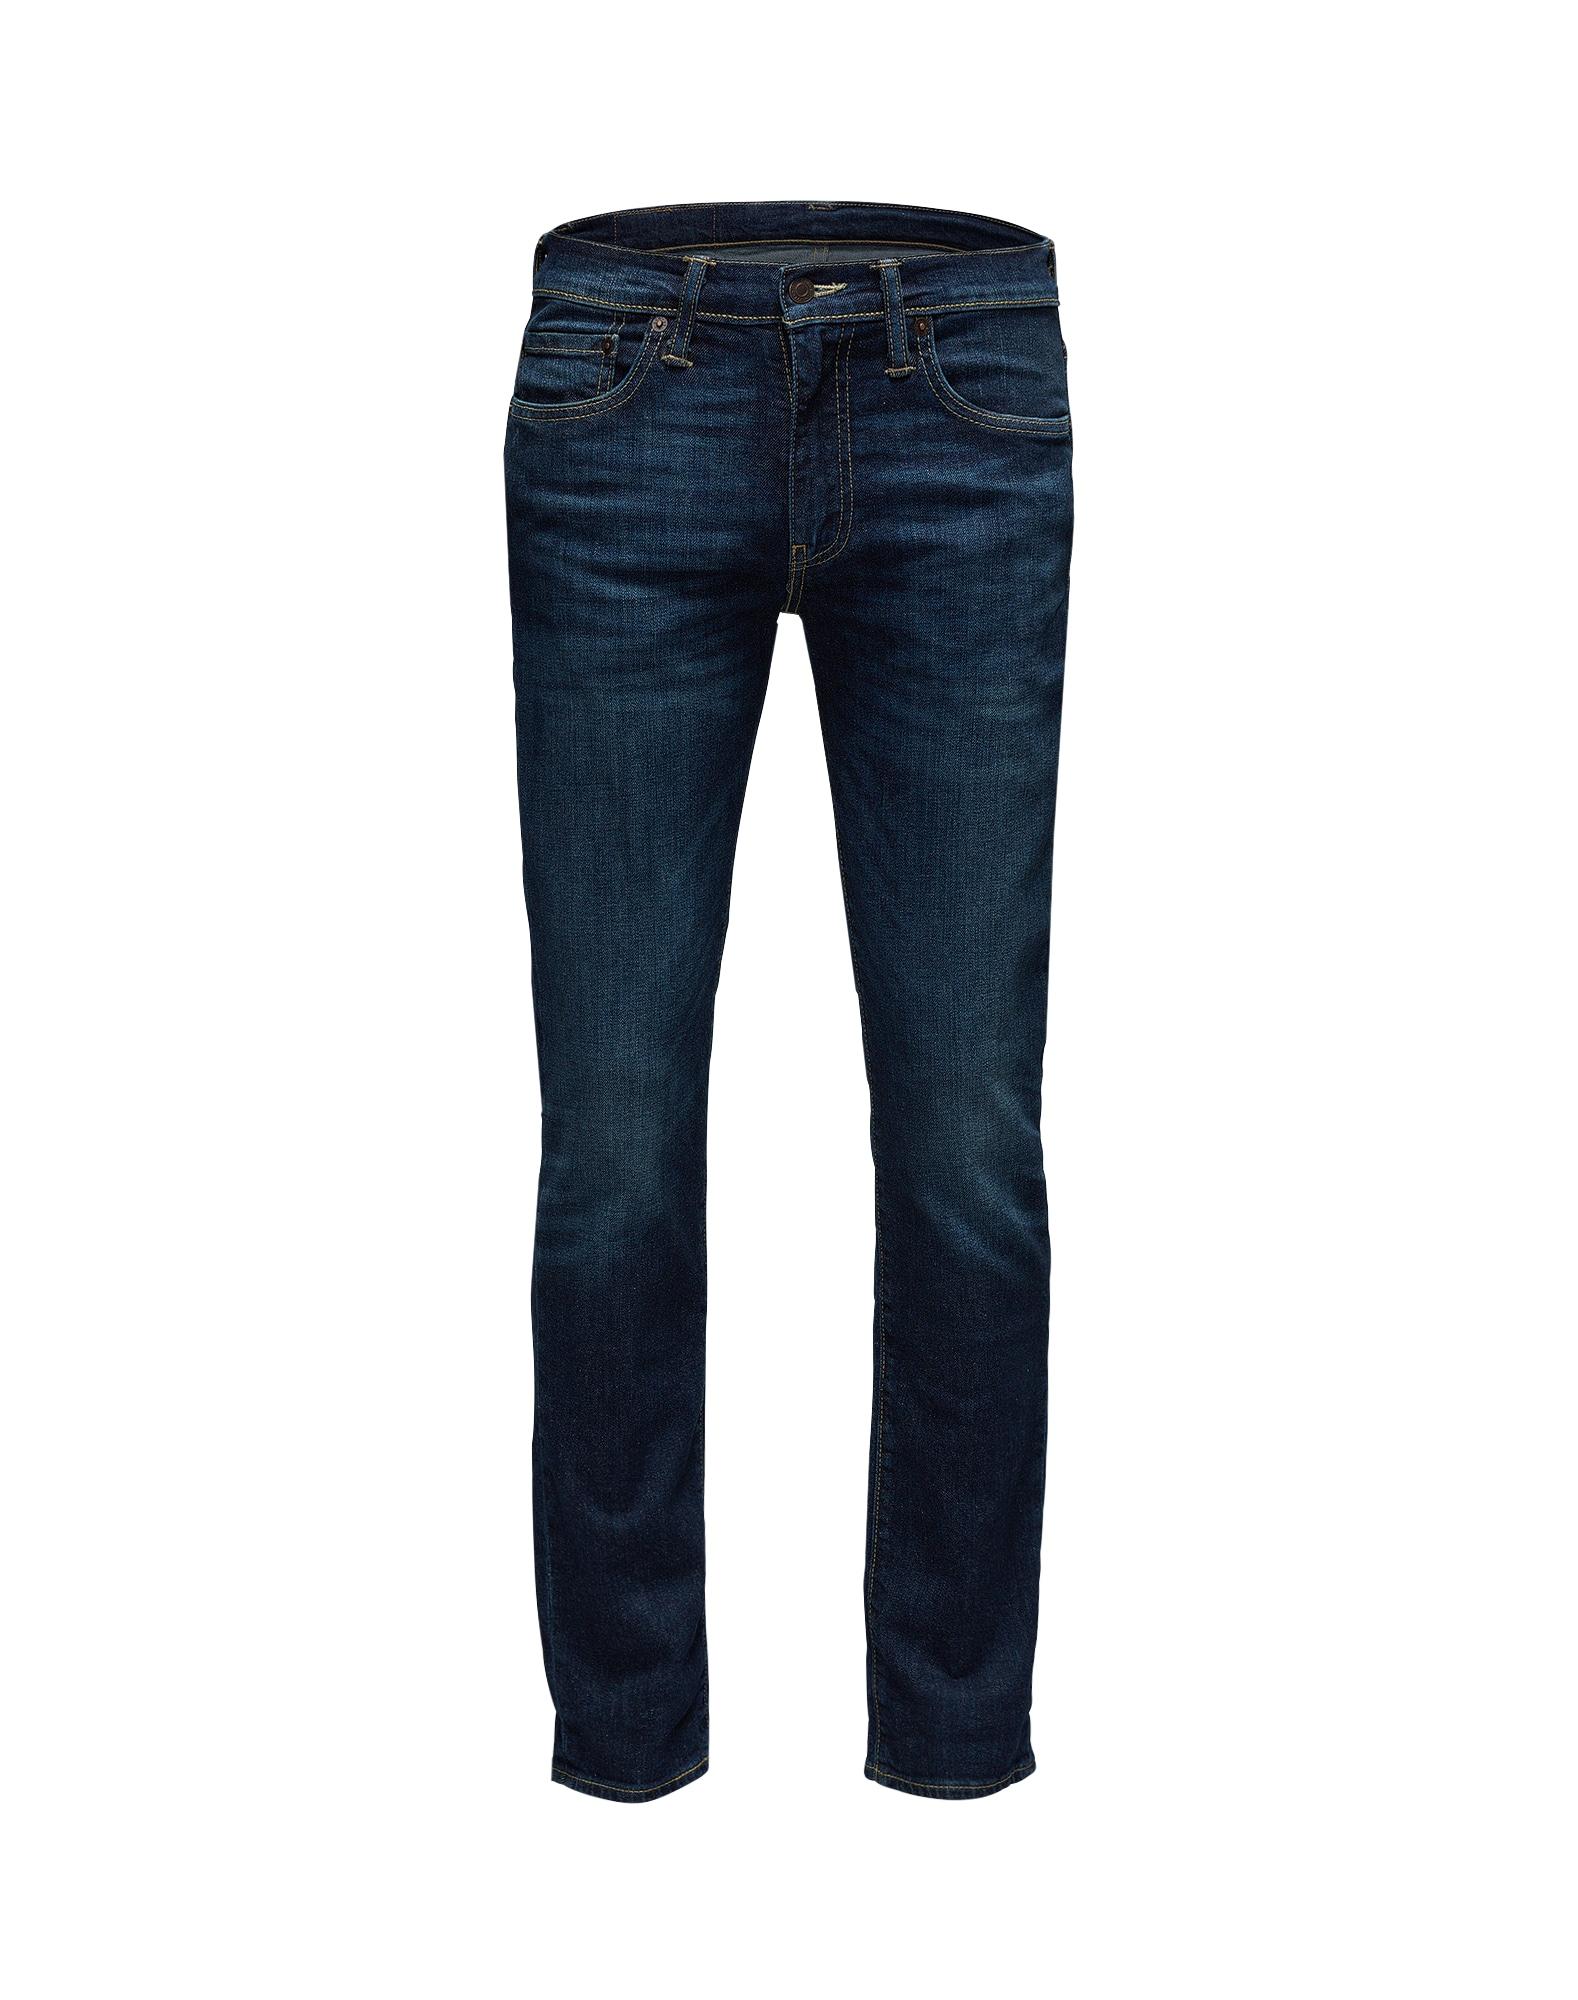 LEVI'S Heren Jeans 511 blauw